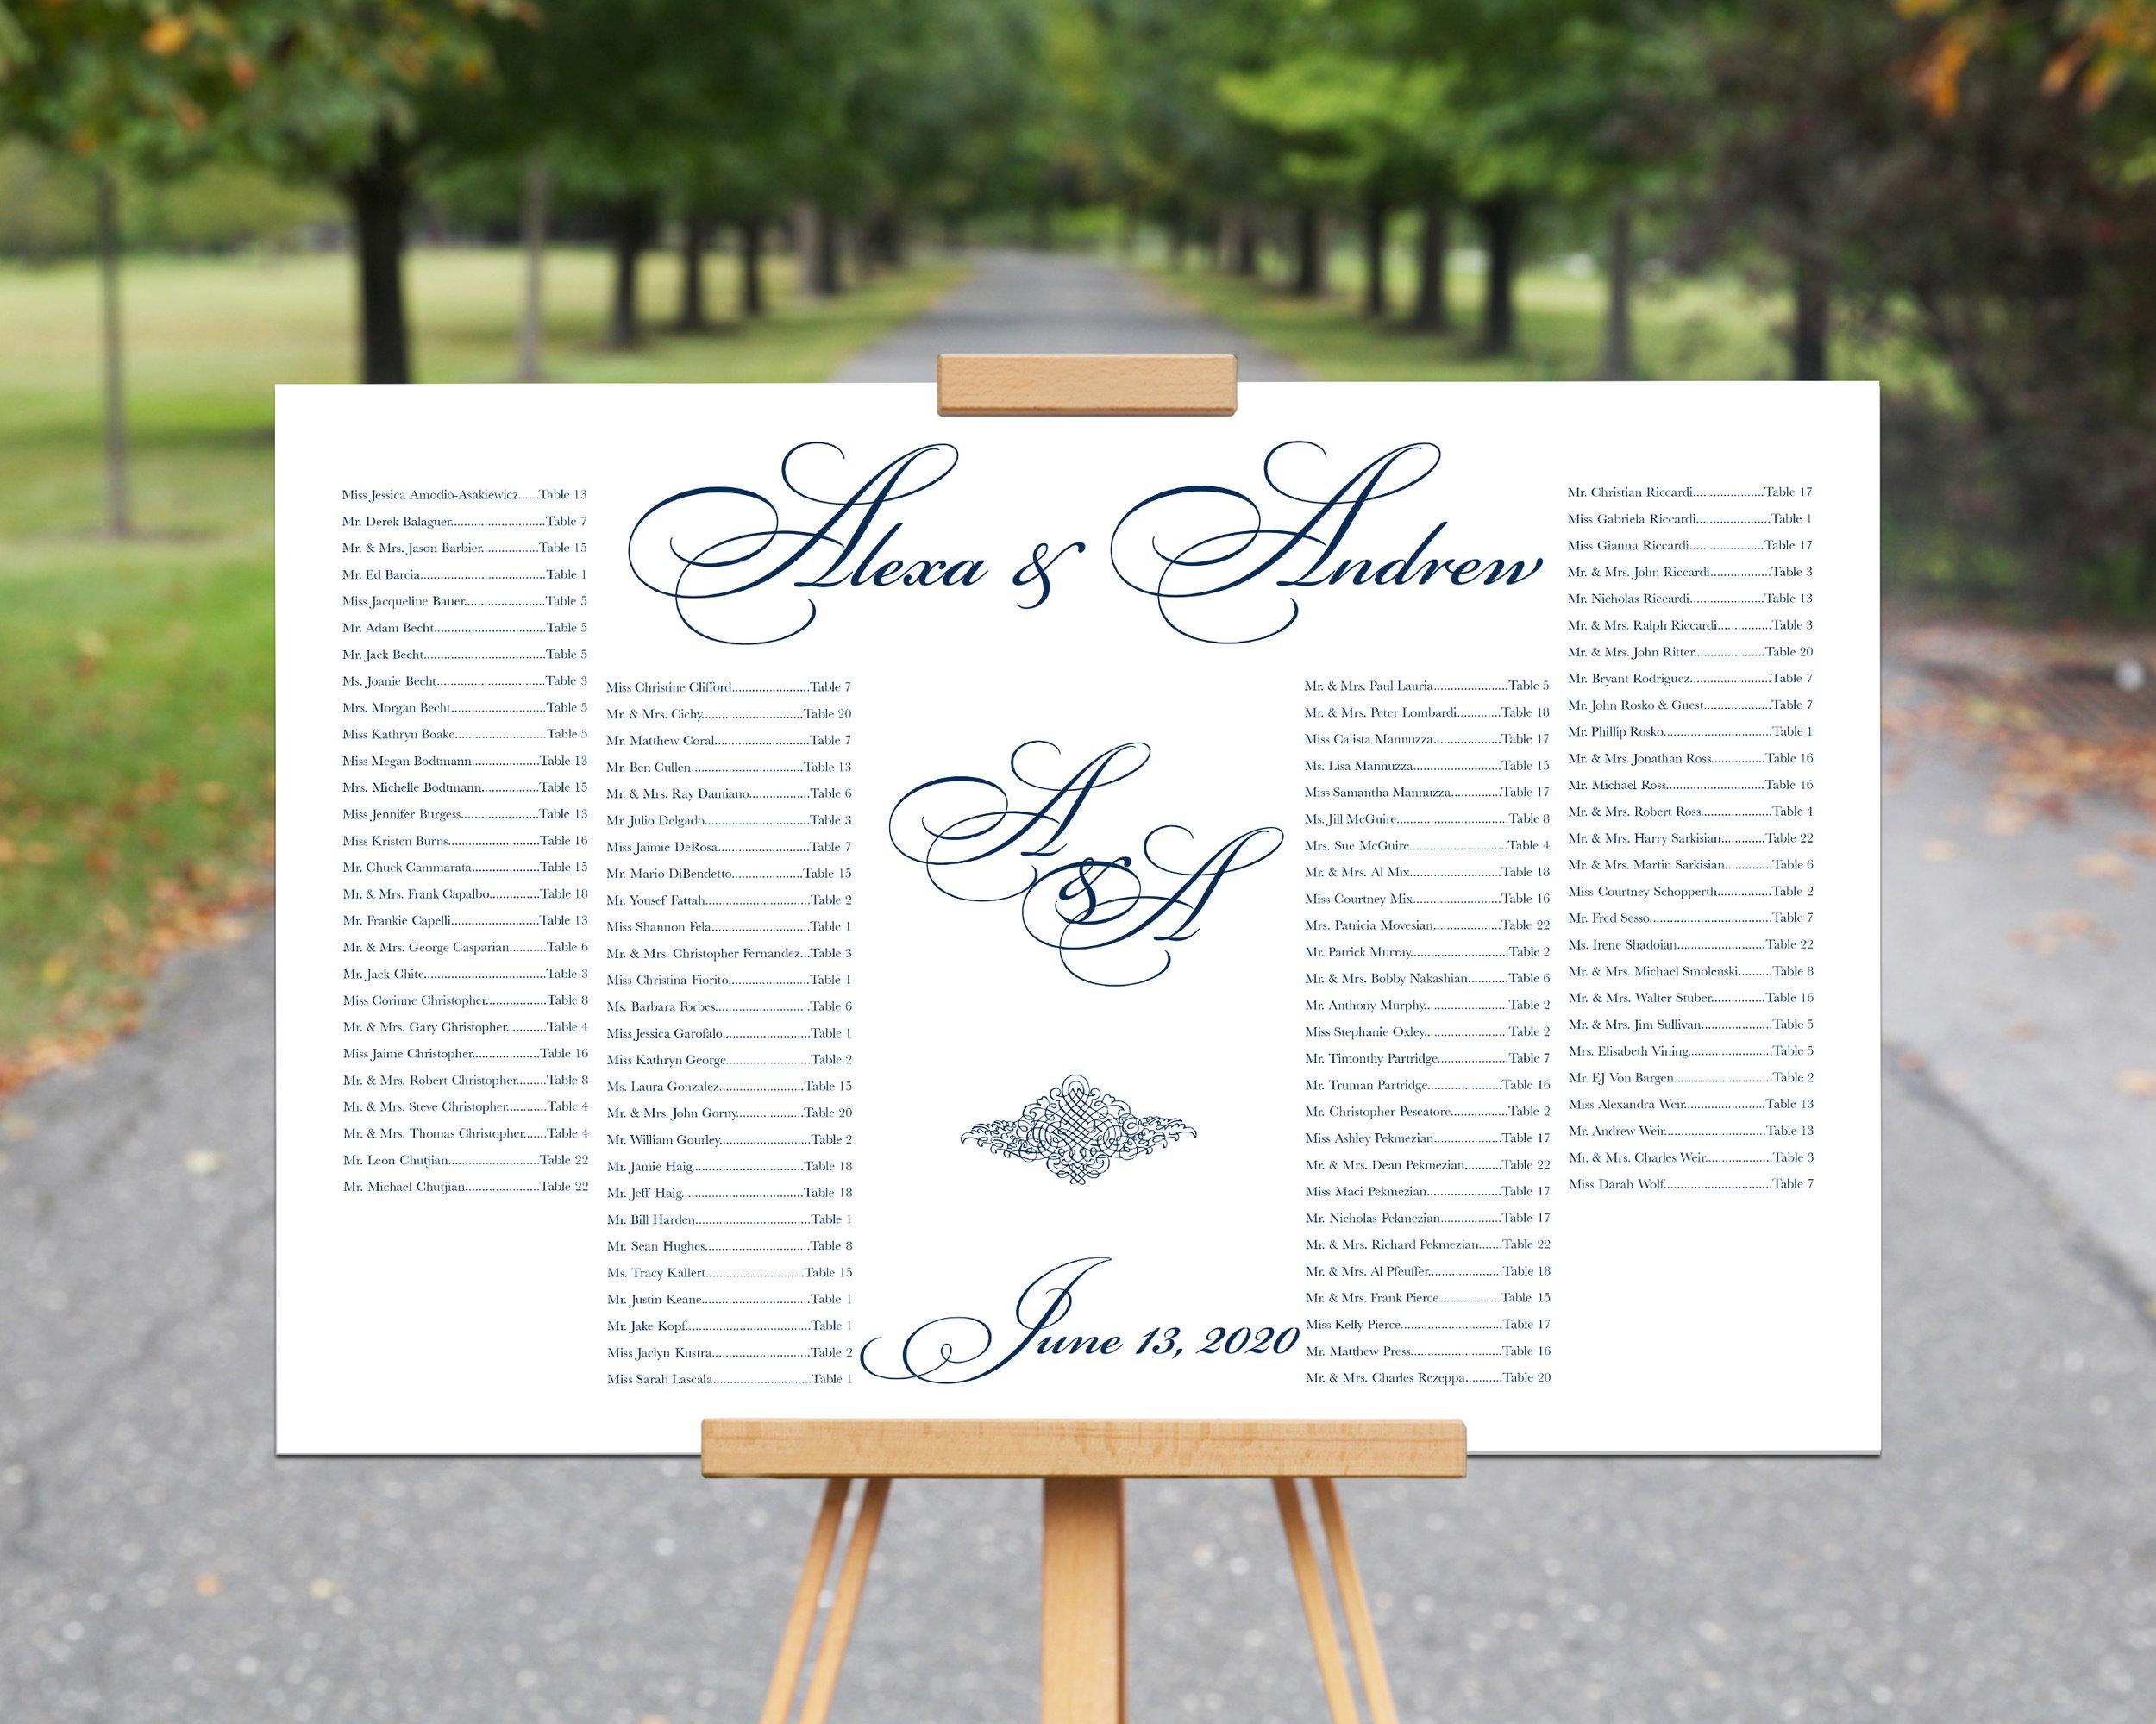 Alexa andrew seating chart design file only pdf also  kalijo works rh kalijoworks